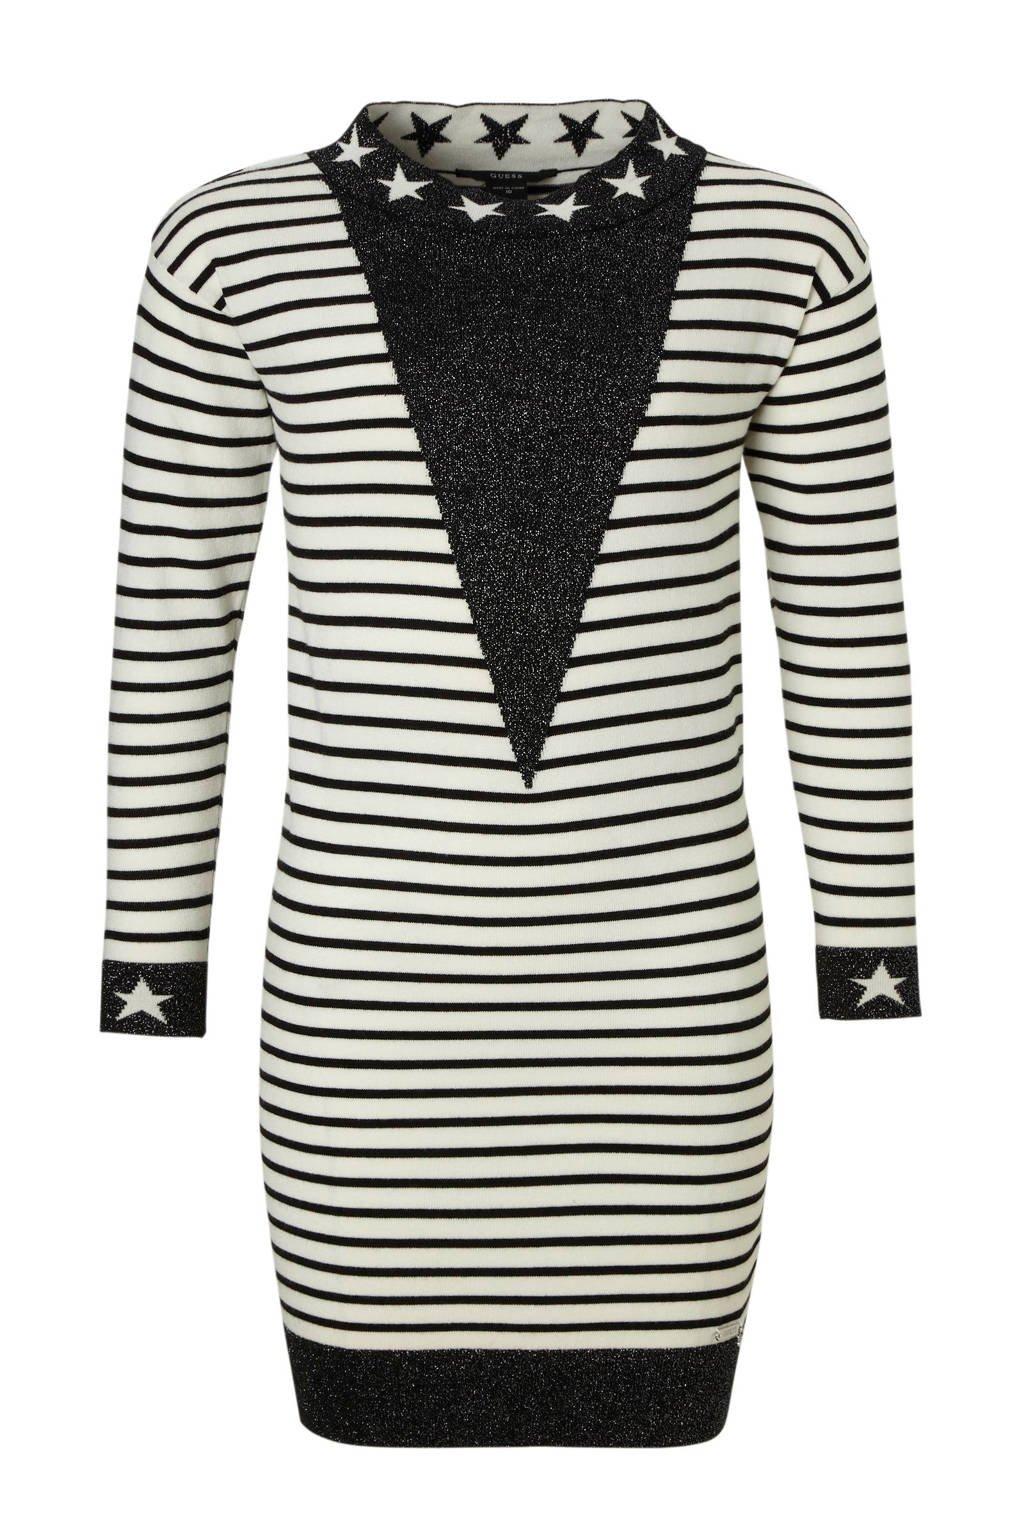 GUESS gebreide jurkmet glitters, zwart/ wit